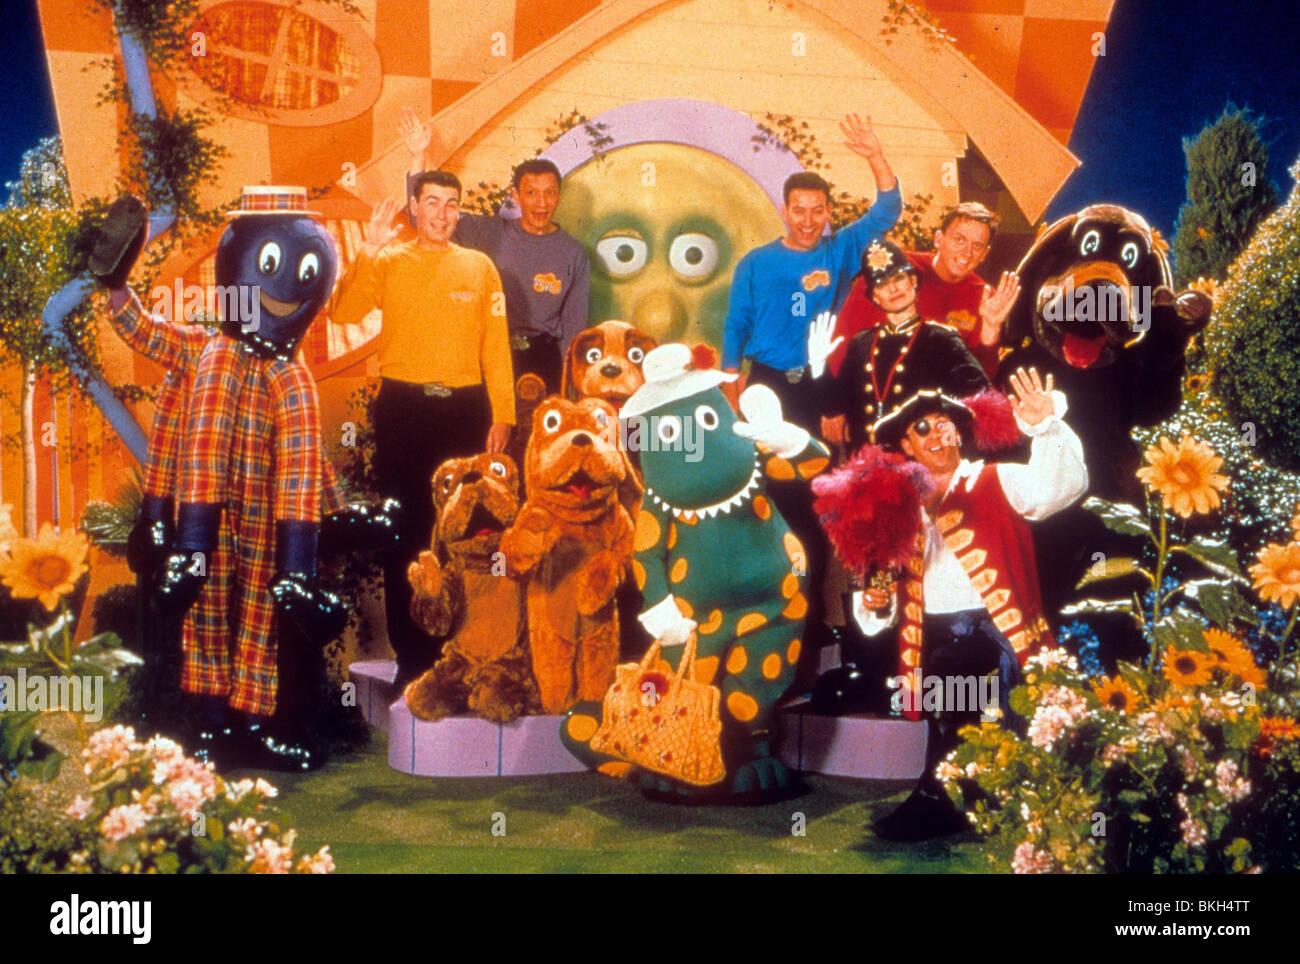 THE WIGGLES MOVIE 1997 Stock Photo 29265848 Alamy